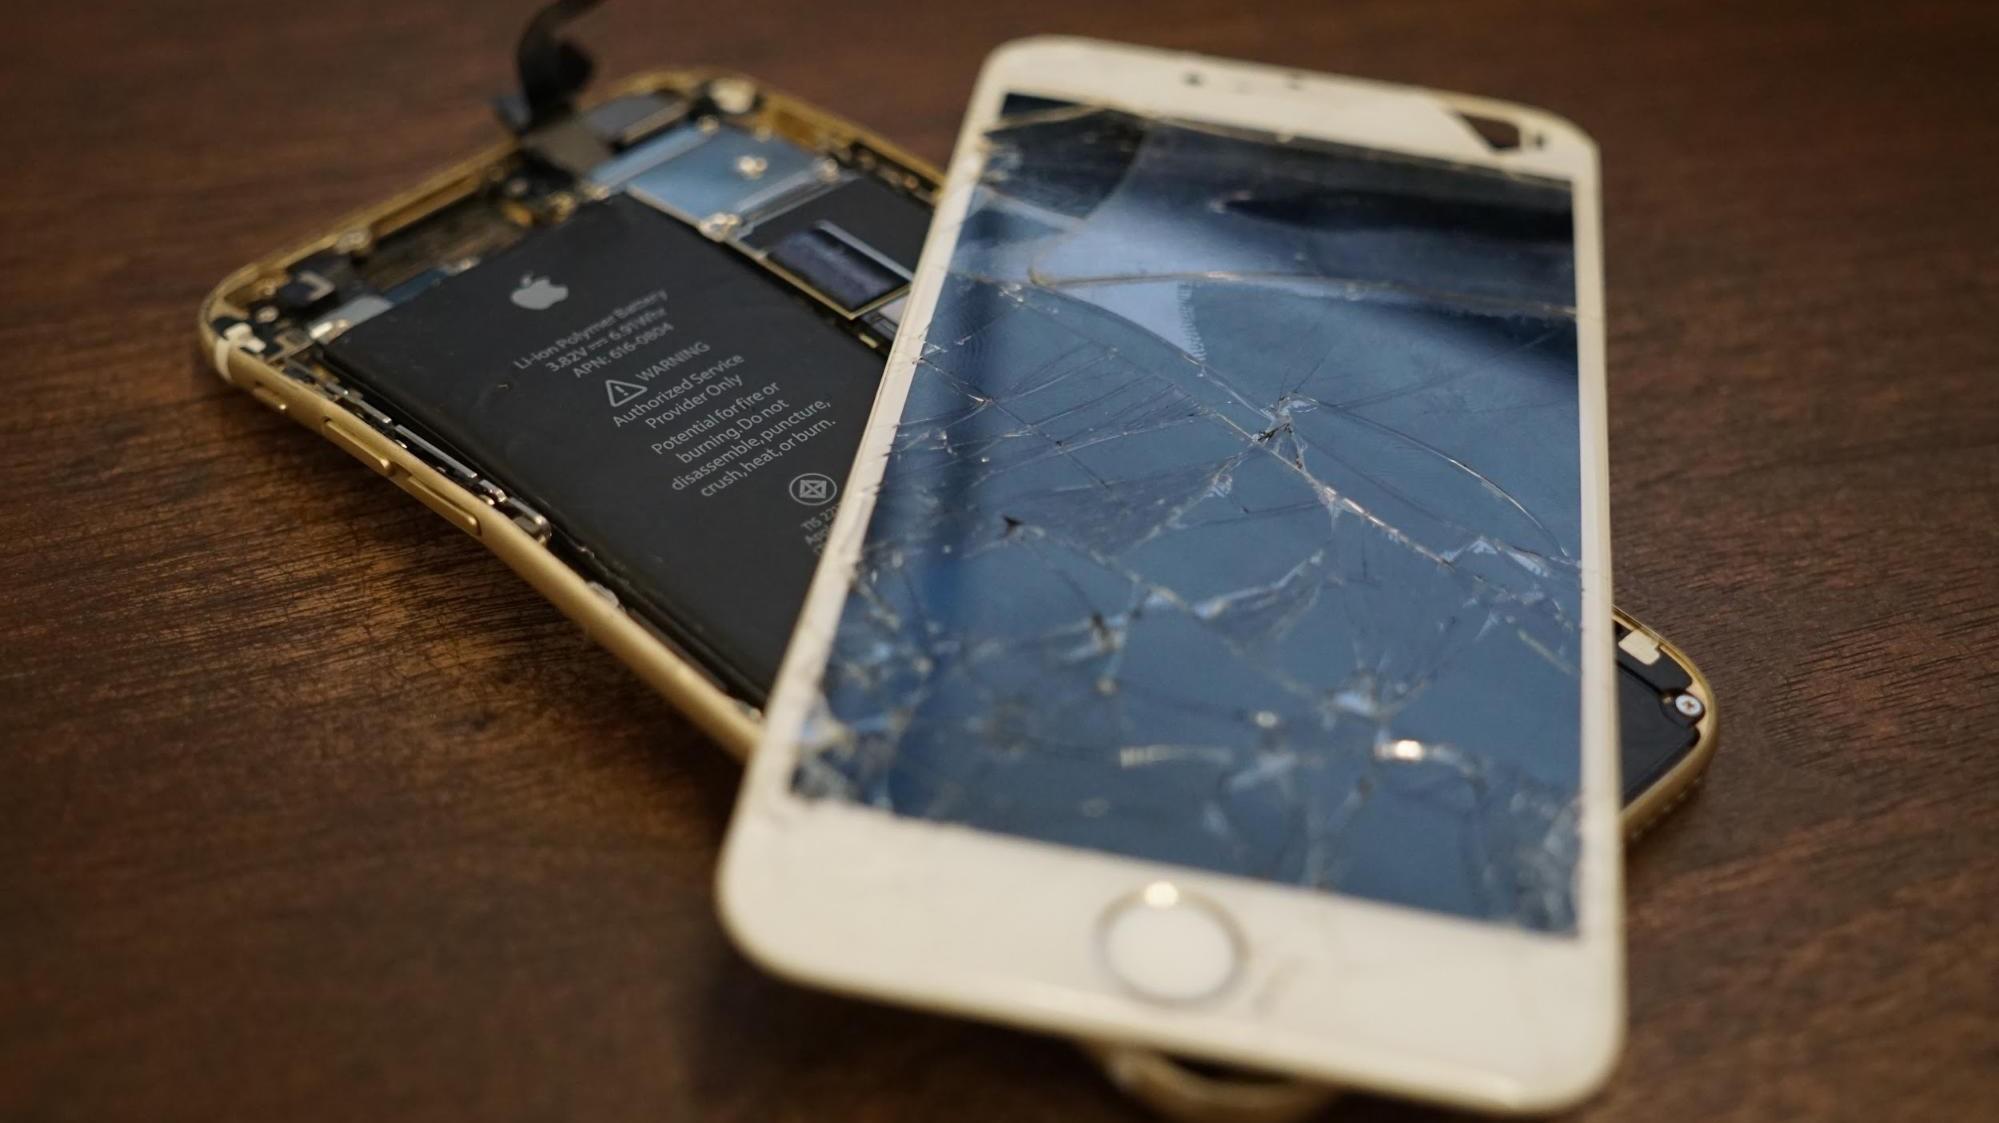 iphone repair. jun 30 2017, 6:27am iphone repair